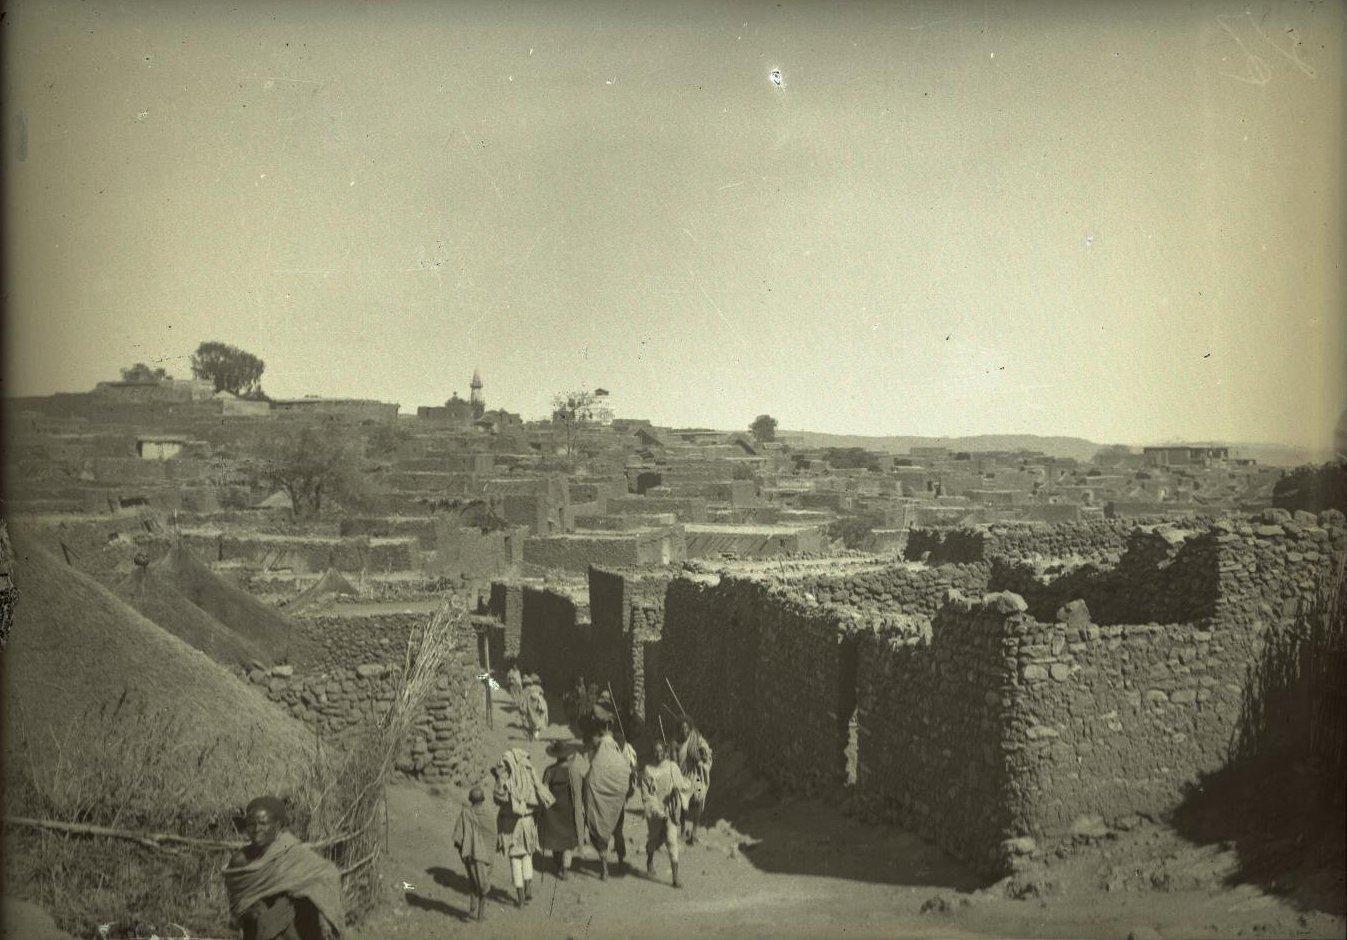 227. Абиссиния, провинция Харар, г. Харар. Общий вид